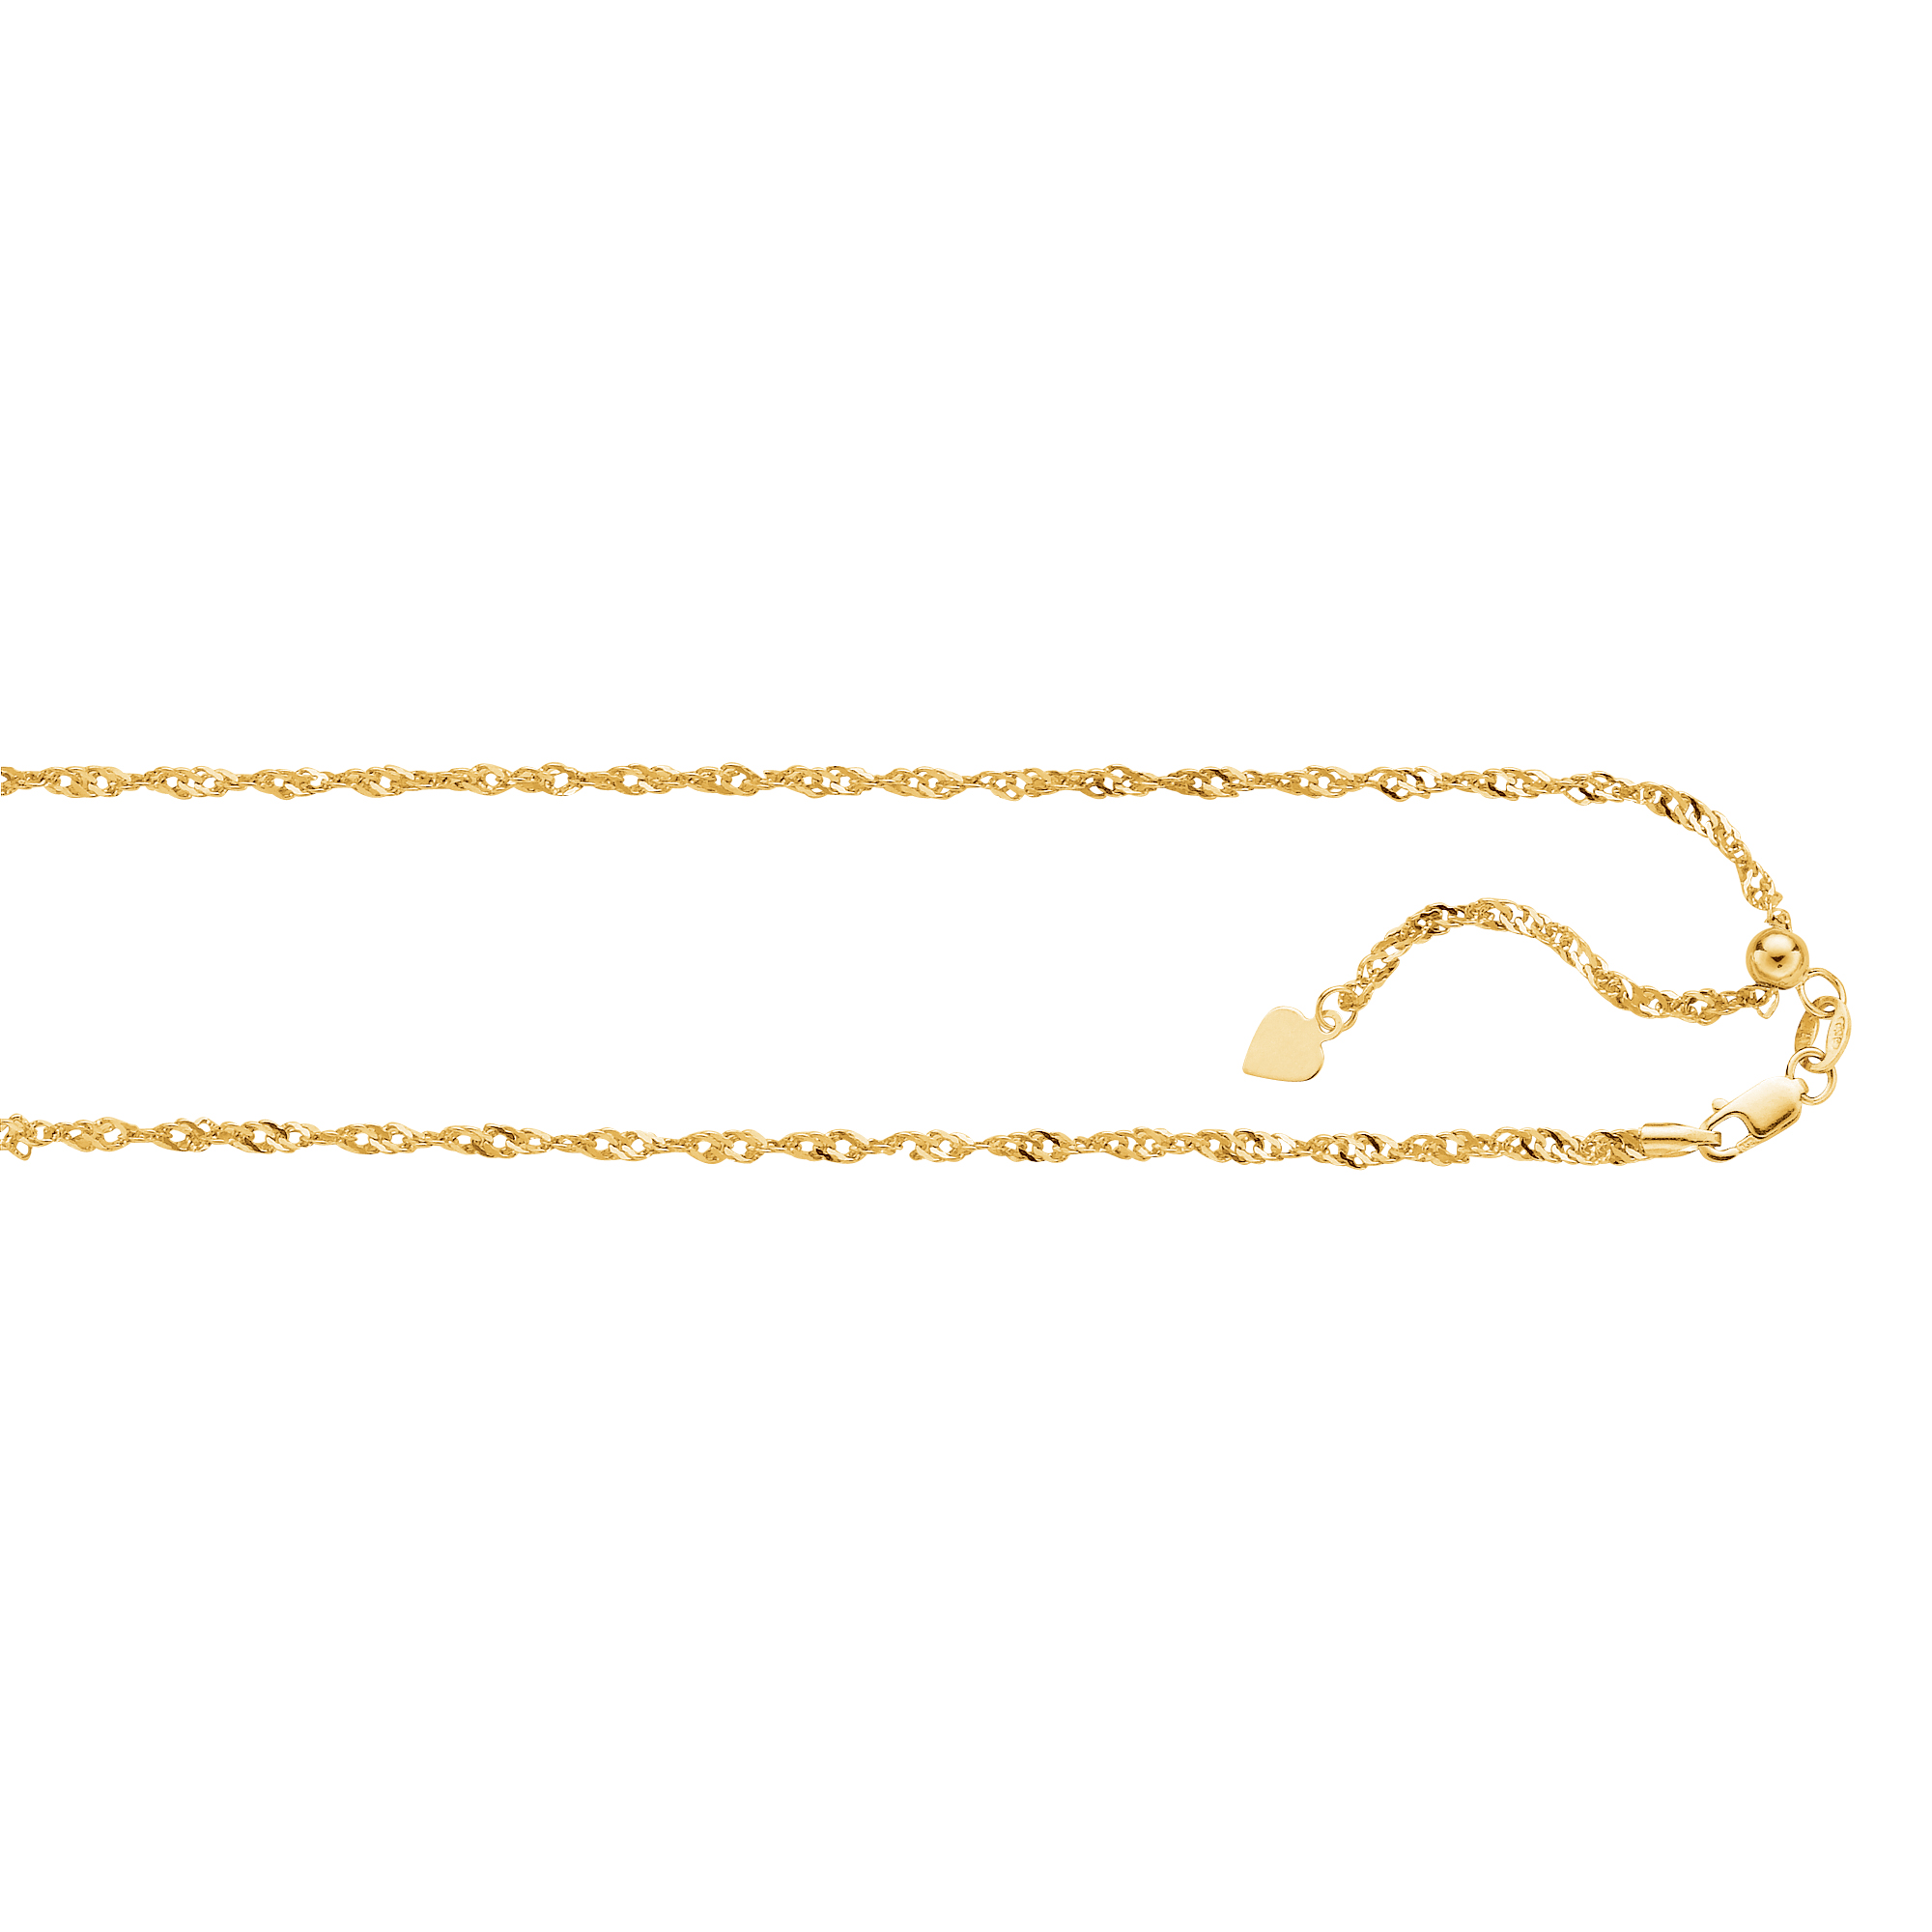 LUXURMAN Solid 14k Gold Singapore Chain For Men & Women 1.1mm Wide